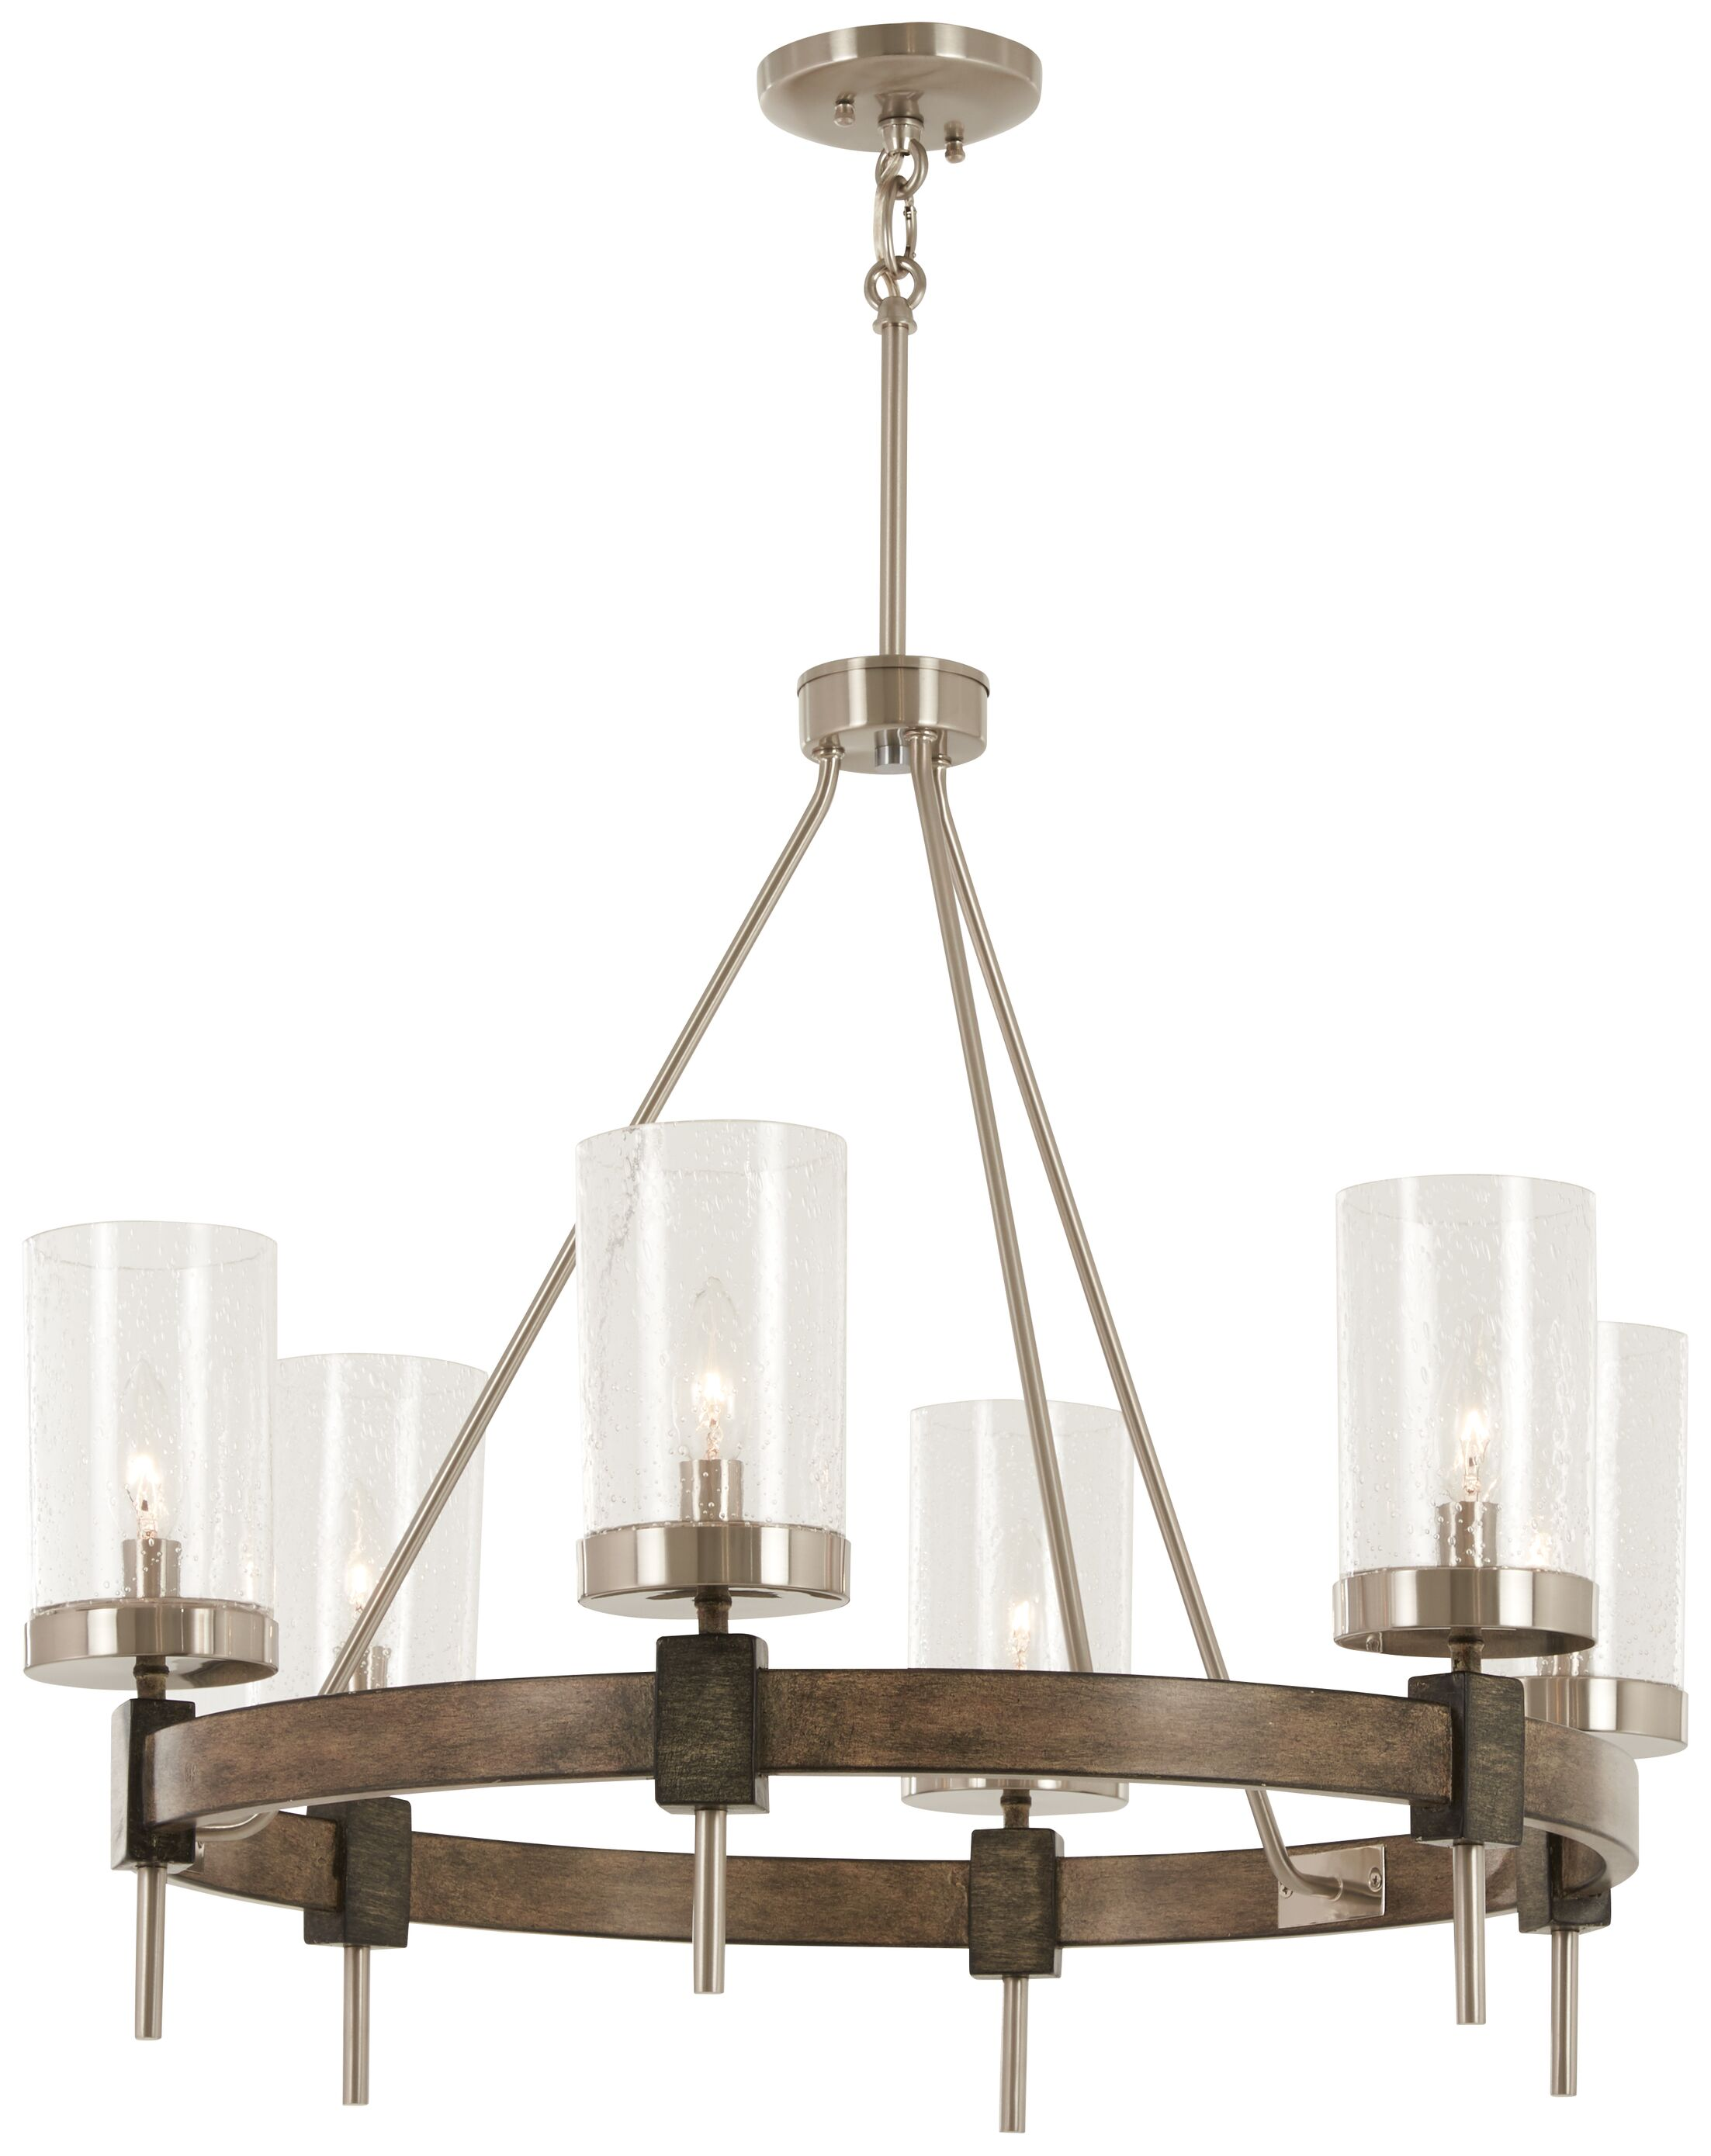 Lipton 6-Light Wagon Wheel Chandelier